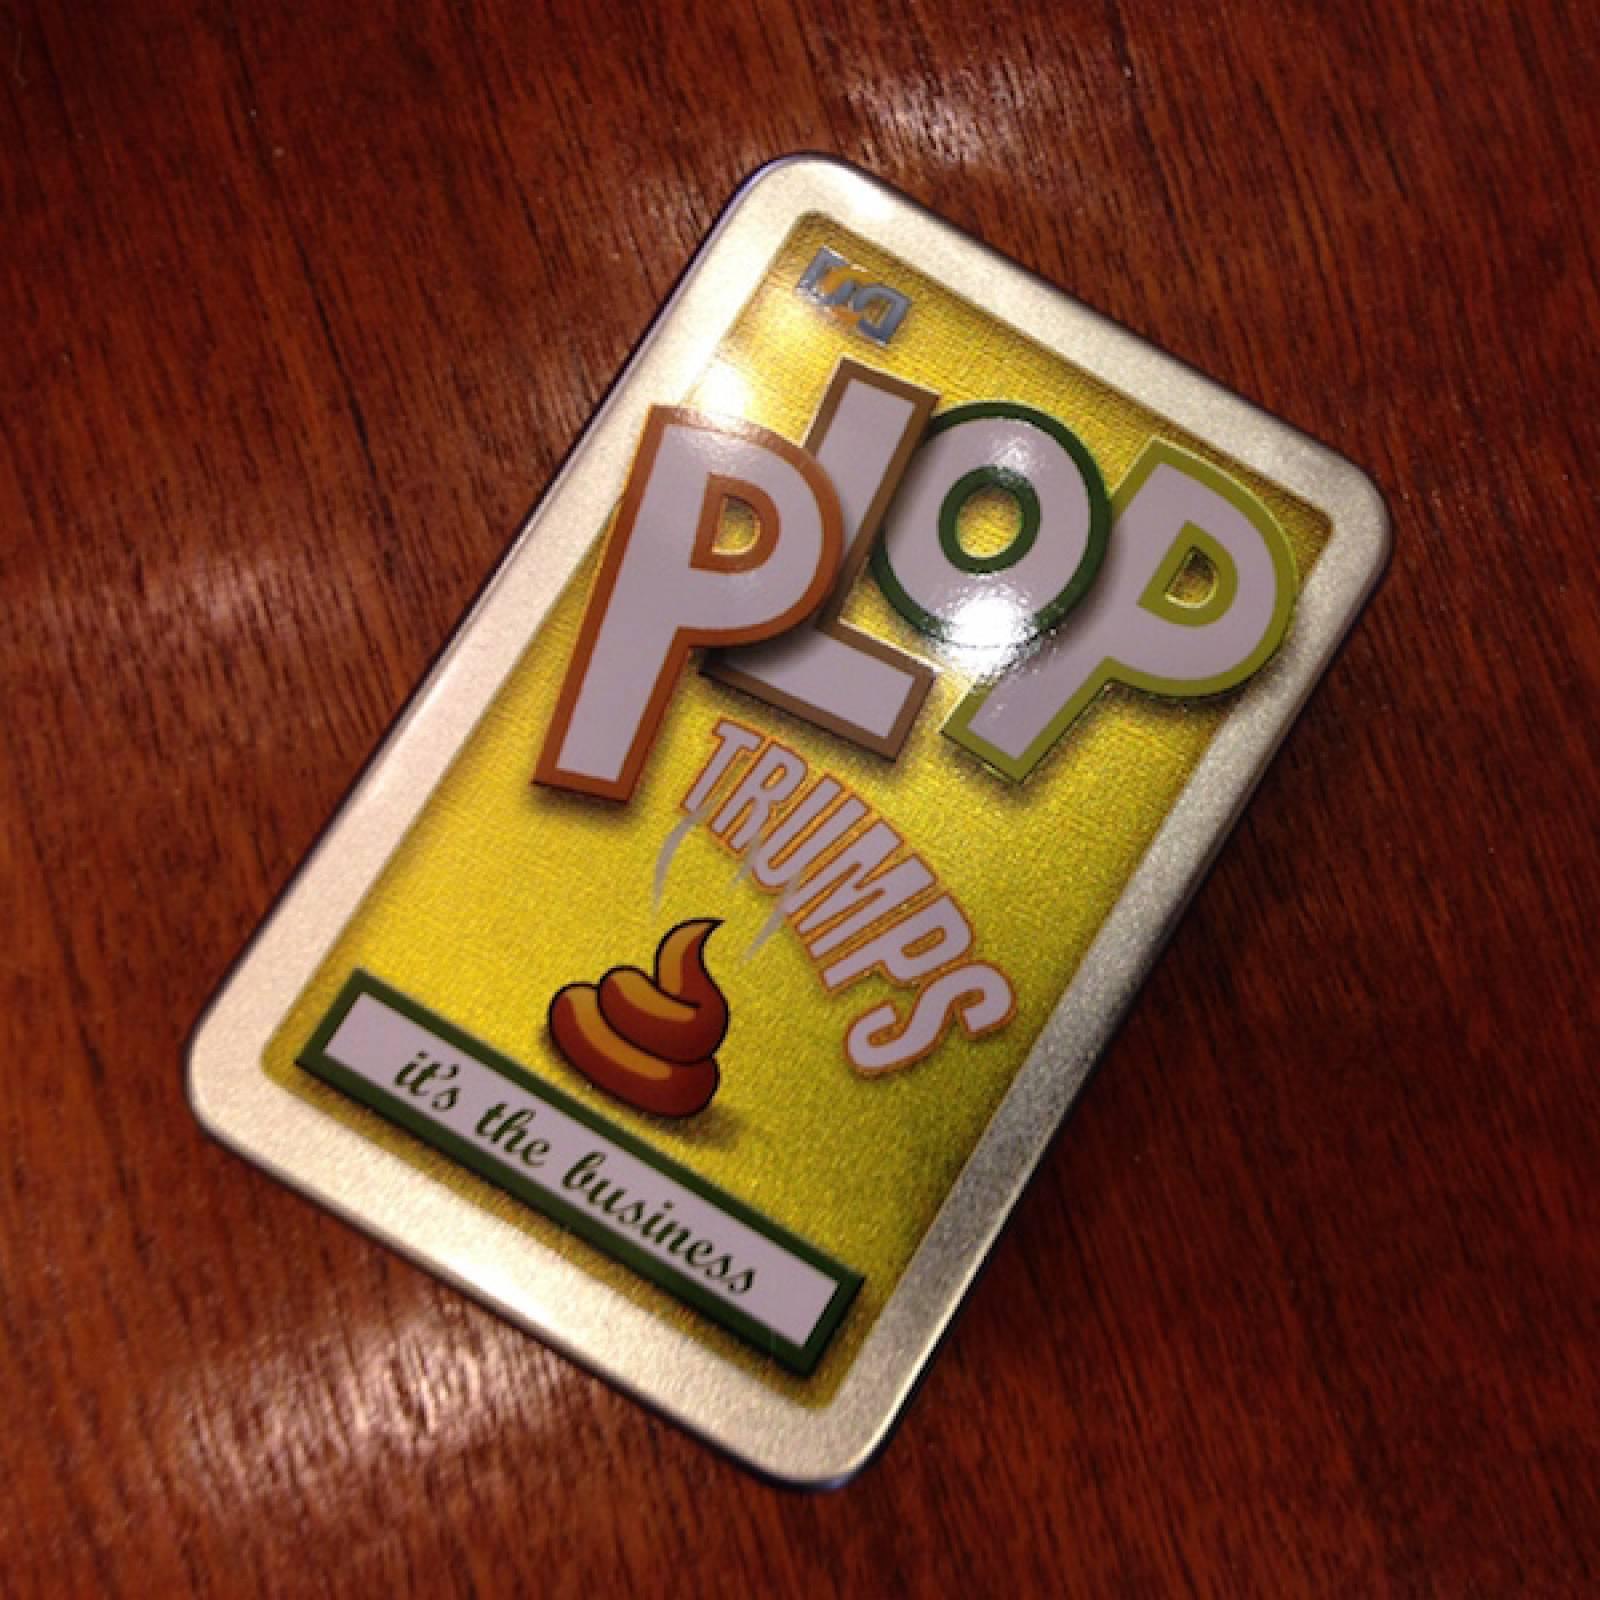 Plop Trumps Card Game 6+